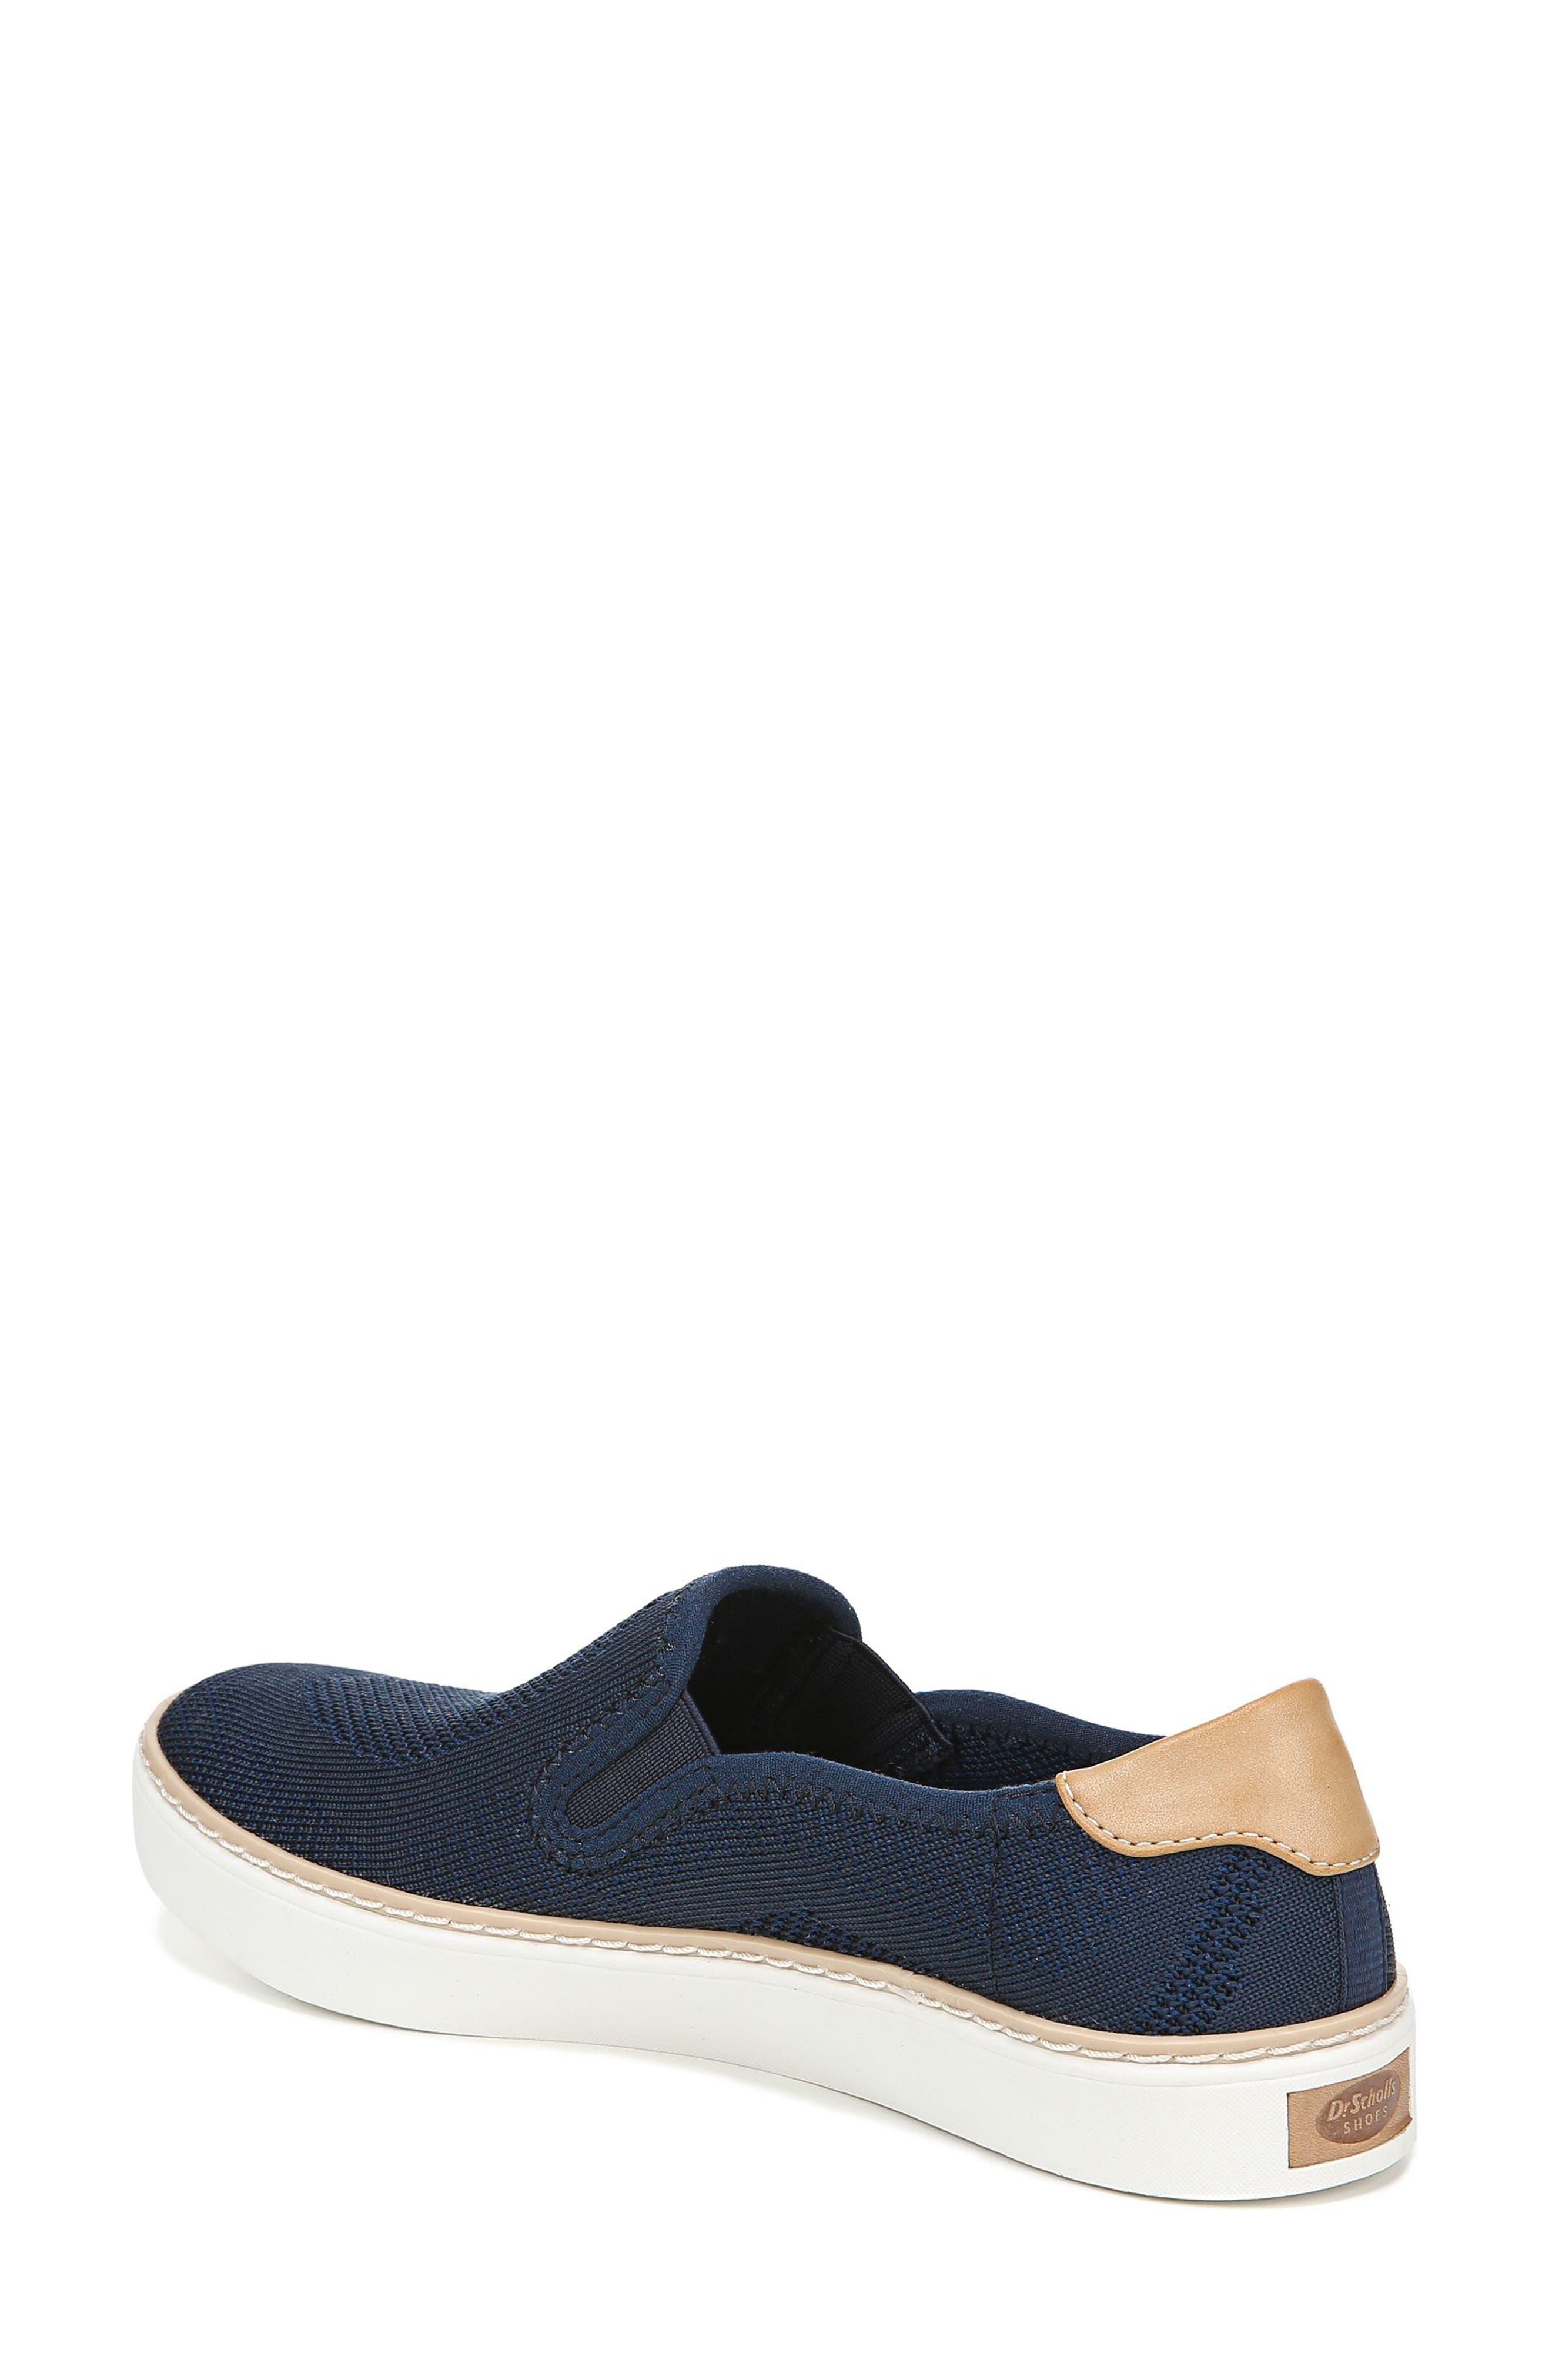 DR. SCHOLL'S, Madi Slip-On Sneaker, Alternate thumbnail 2, color, NAVY KNIT FABRIC